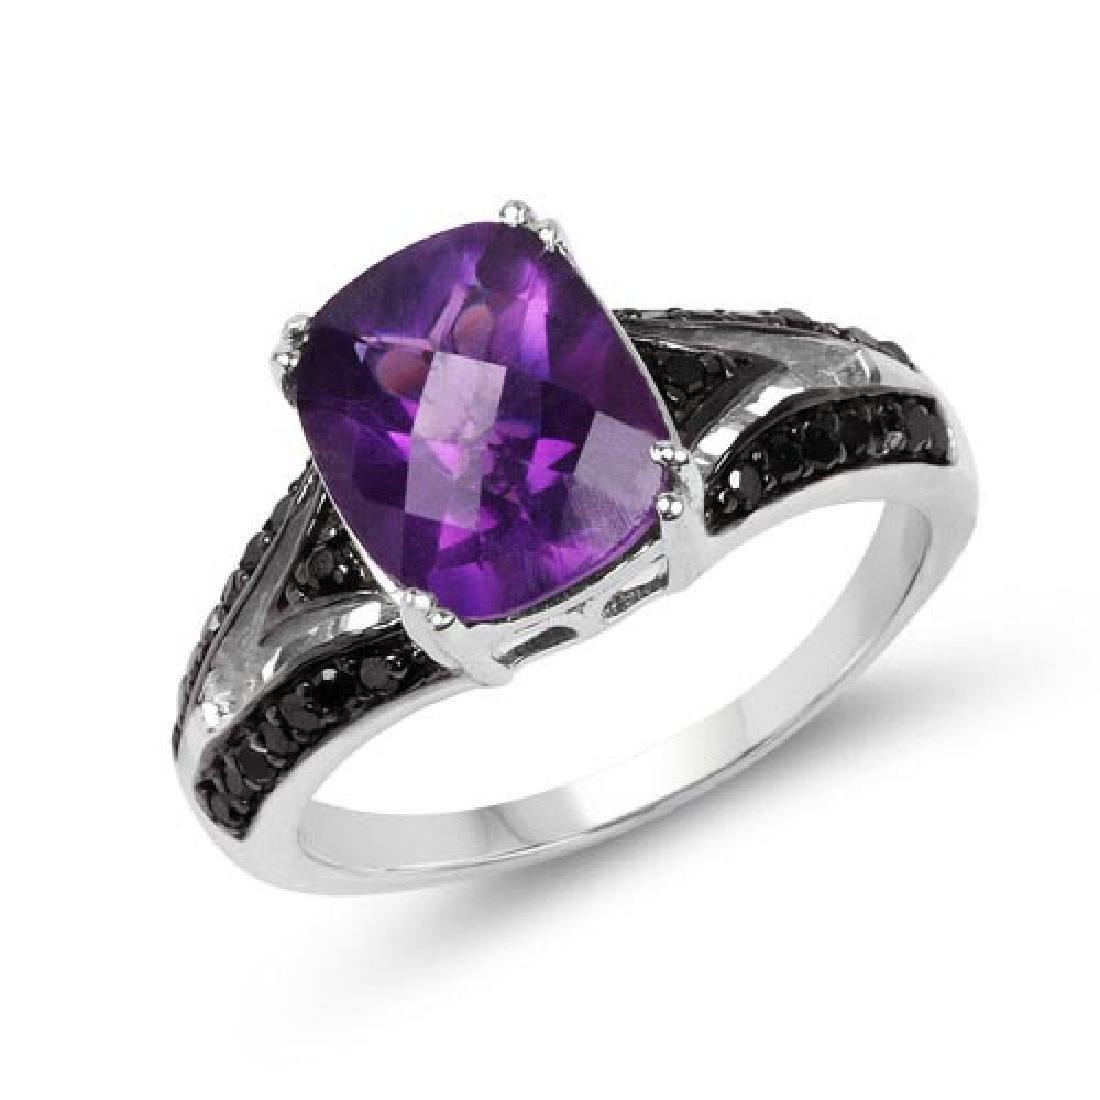 2.87 Carat Genuine Amethyst Black Diamond and White Dia